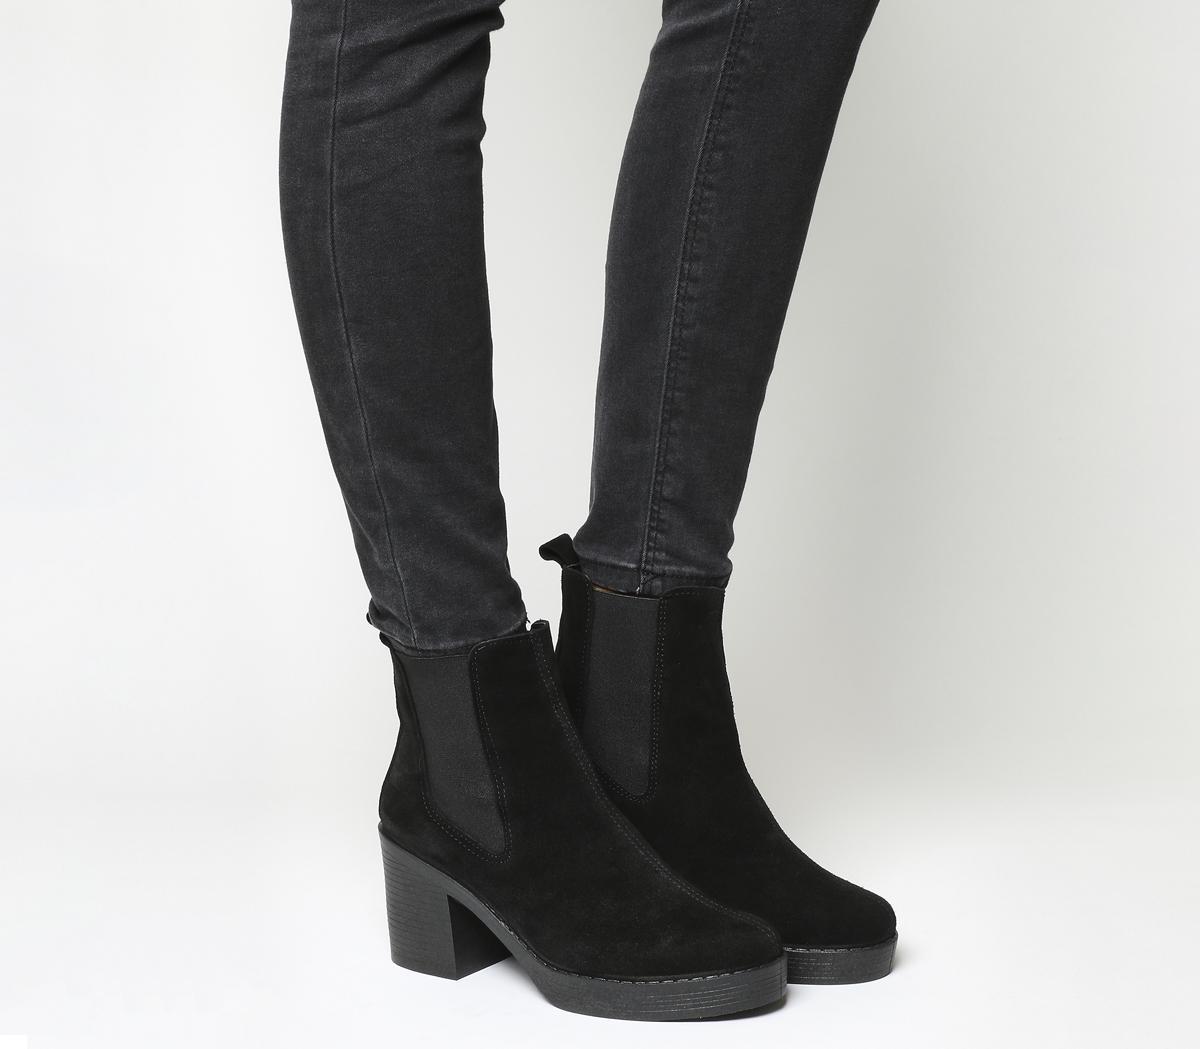 designer fashion d4606 bf5c2 office-black-Alesha-Block-Heel-Chelsea-Boots.jpeg